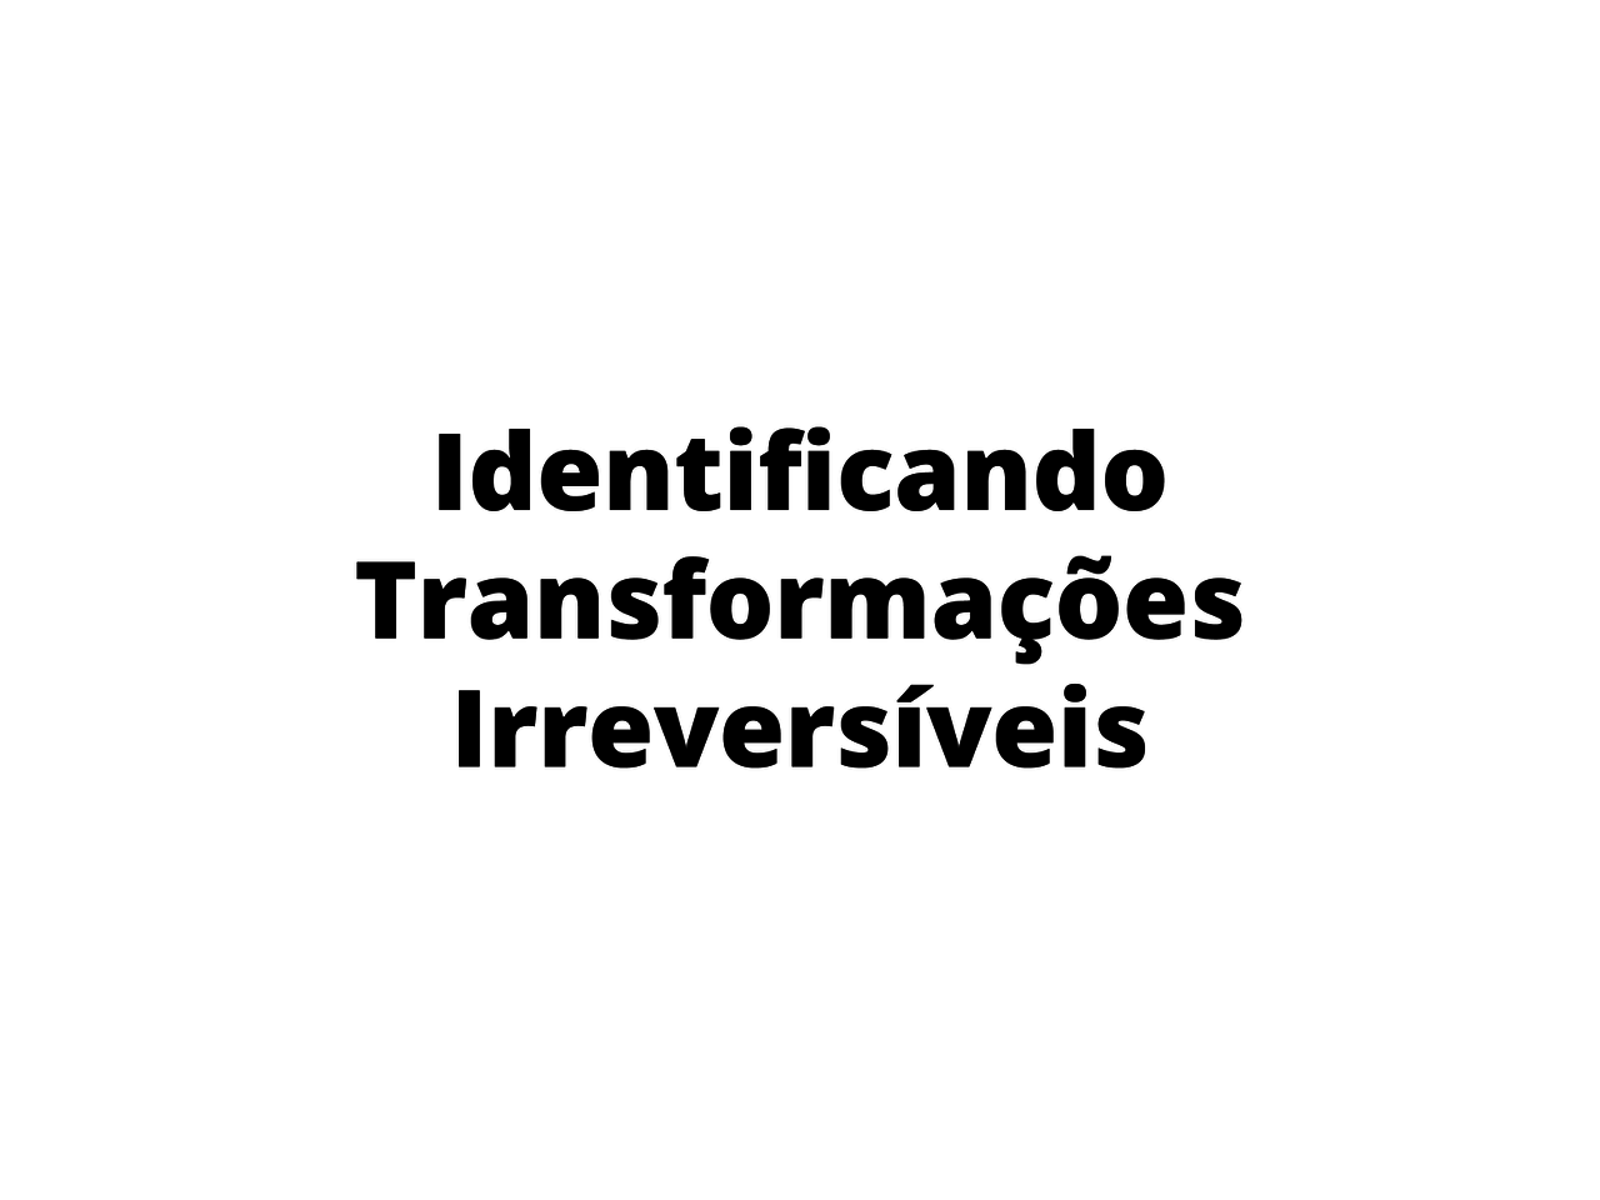 Identificando transformações irreversíveis